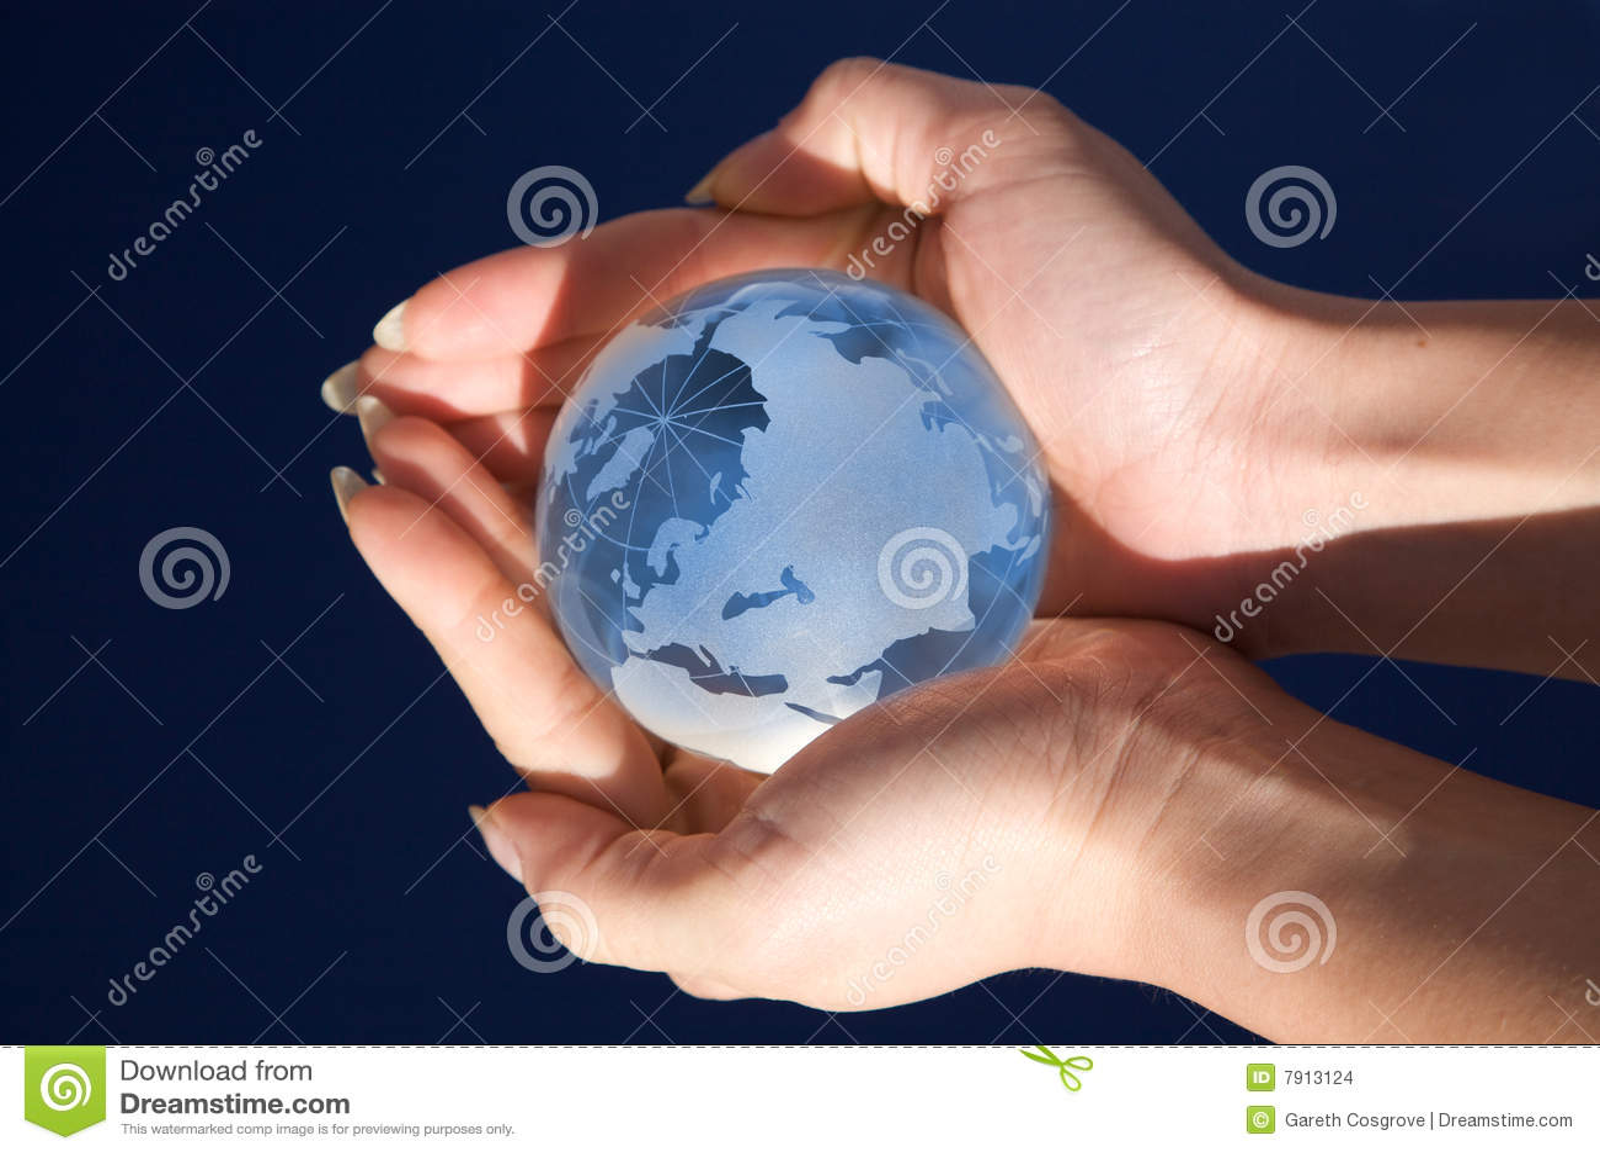 World in her hands